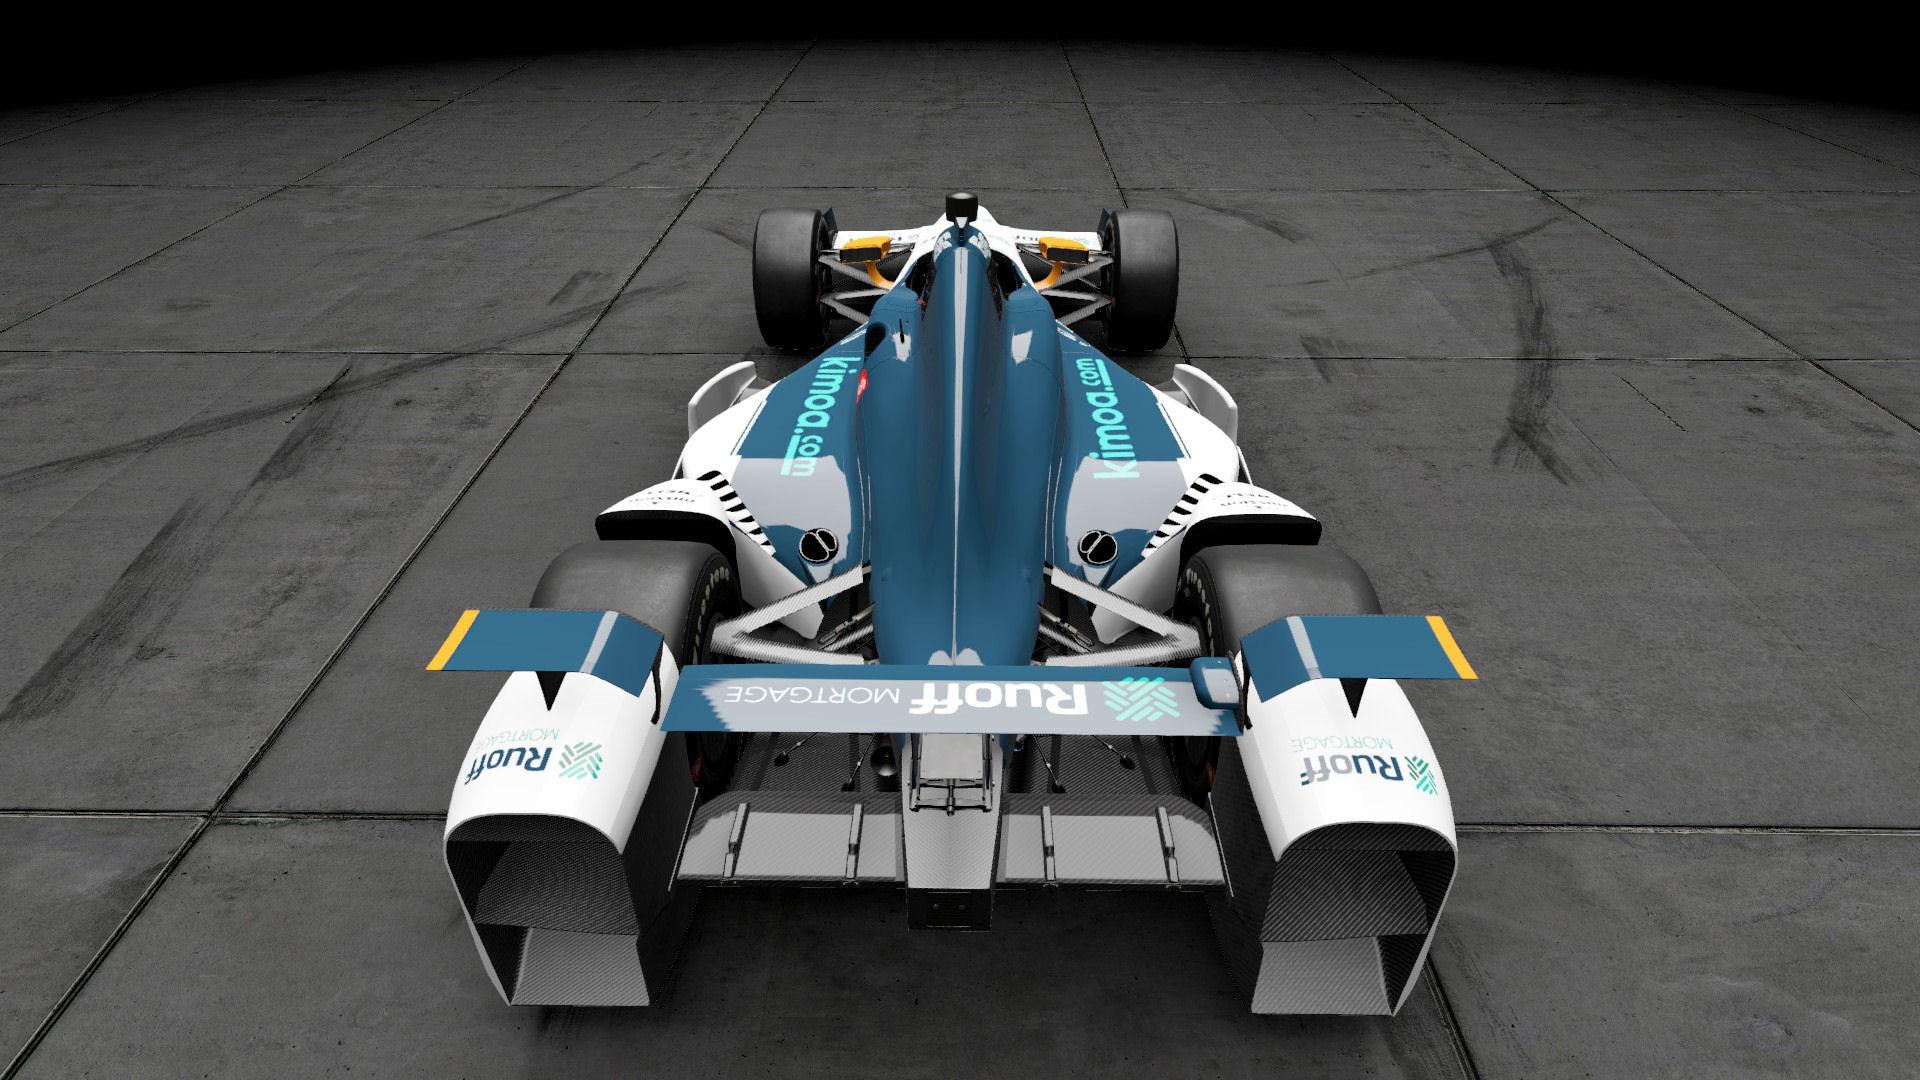 Fernando Alonso 2020 Indy 500 Mclaren dallara dw12 chevy oval 05.jpg